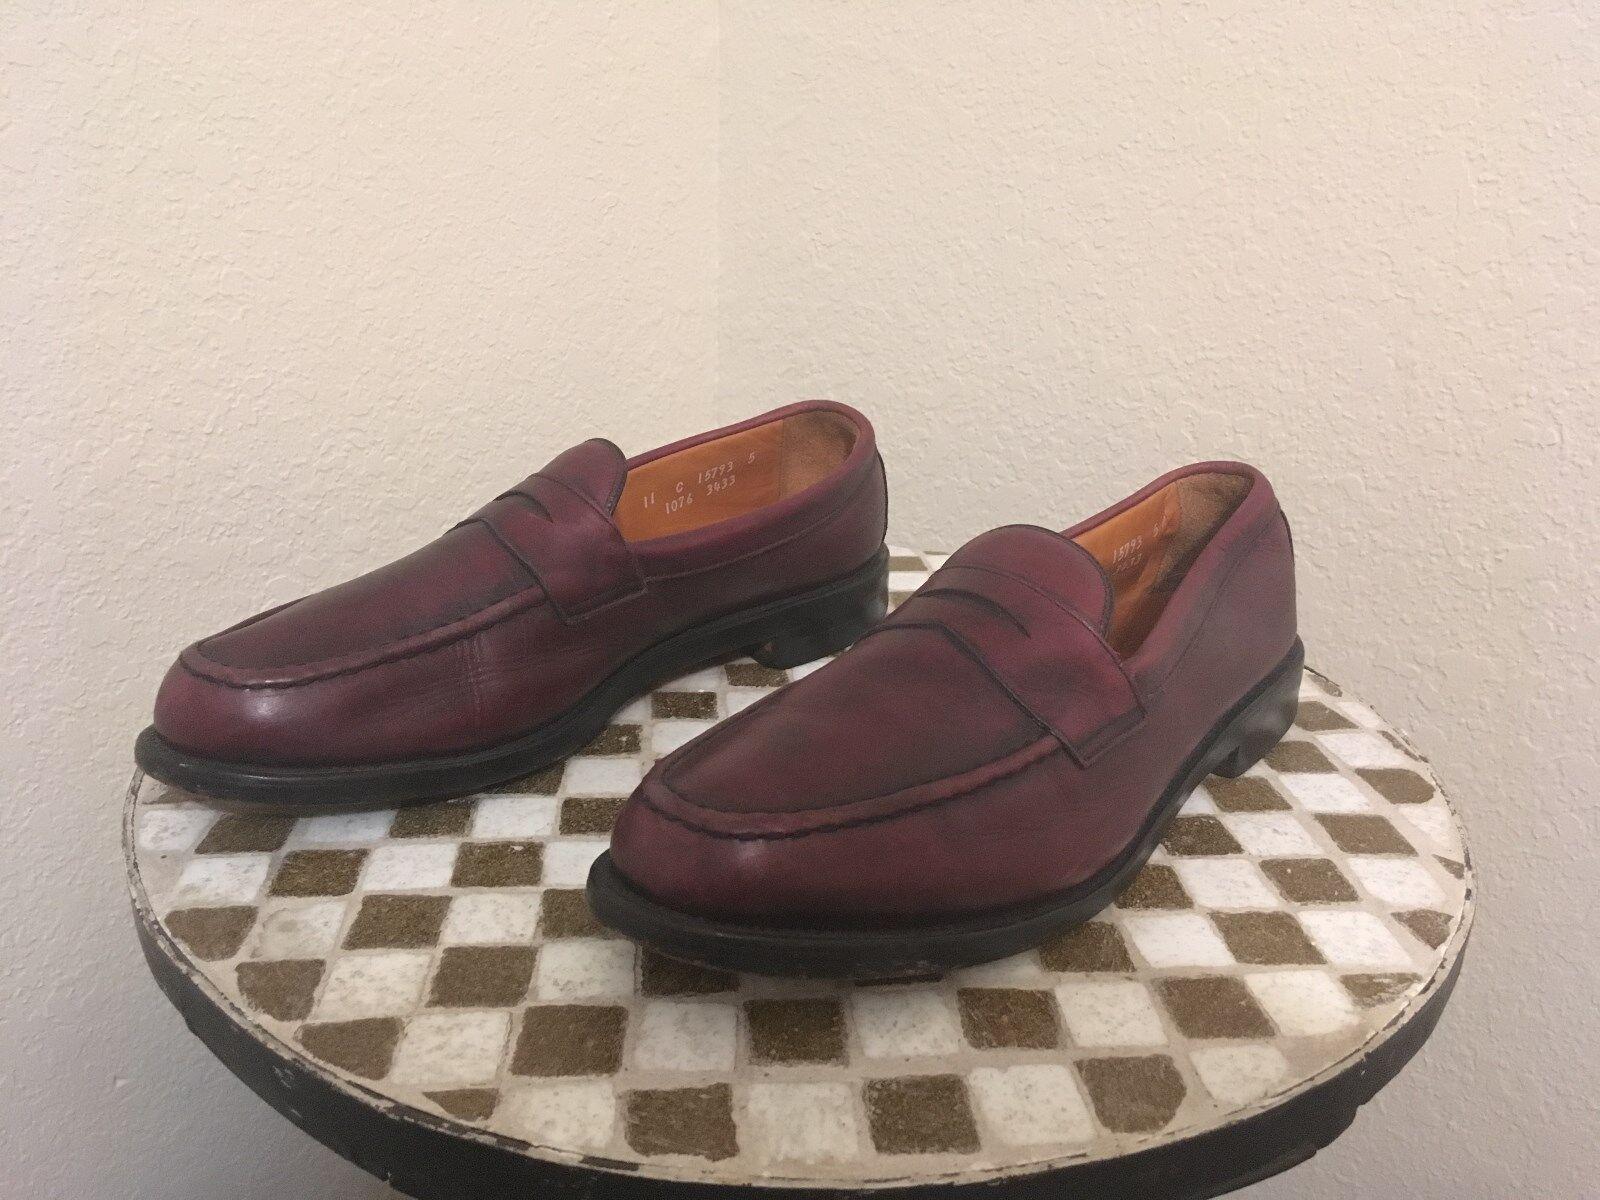 OXBLOOD COLE ALLEN EDMONDS USA BUSINESS CASUAL SHOES 11 C Scarpe classiche da uomo